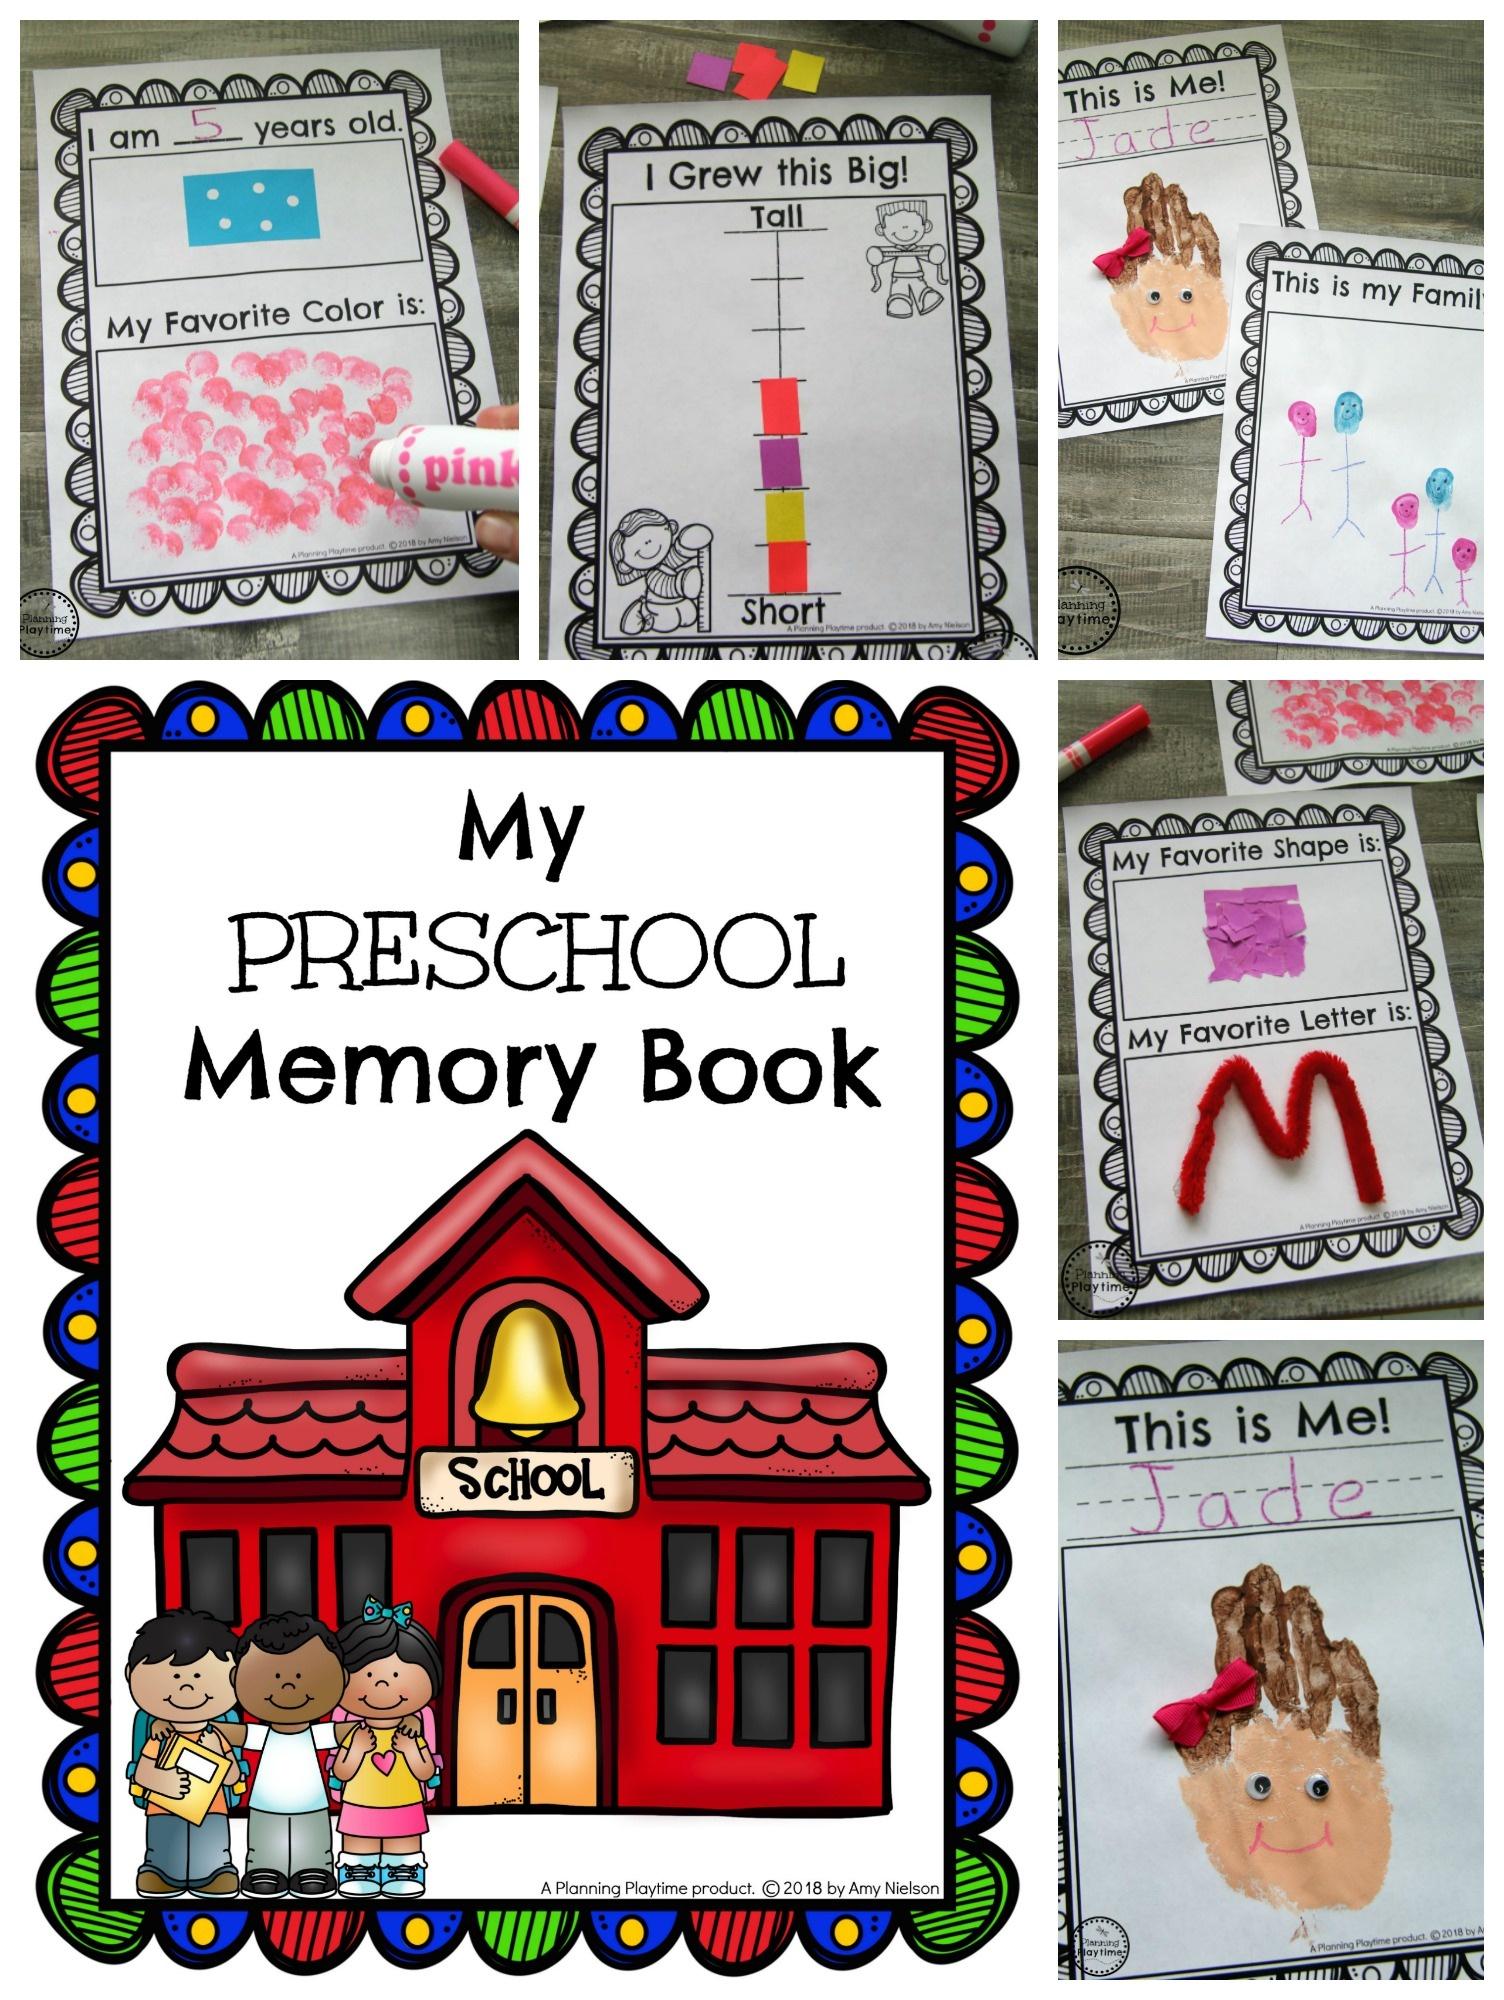 Preschool Memory Book - Planning Playtime - Free Printable Preschool Memory Book